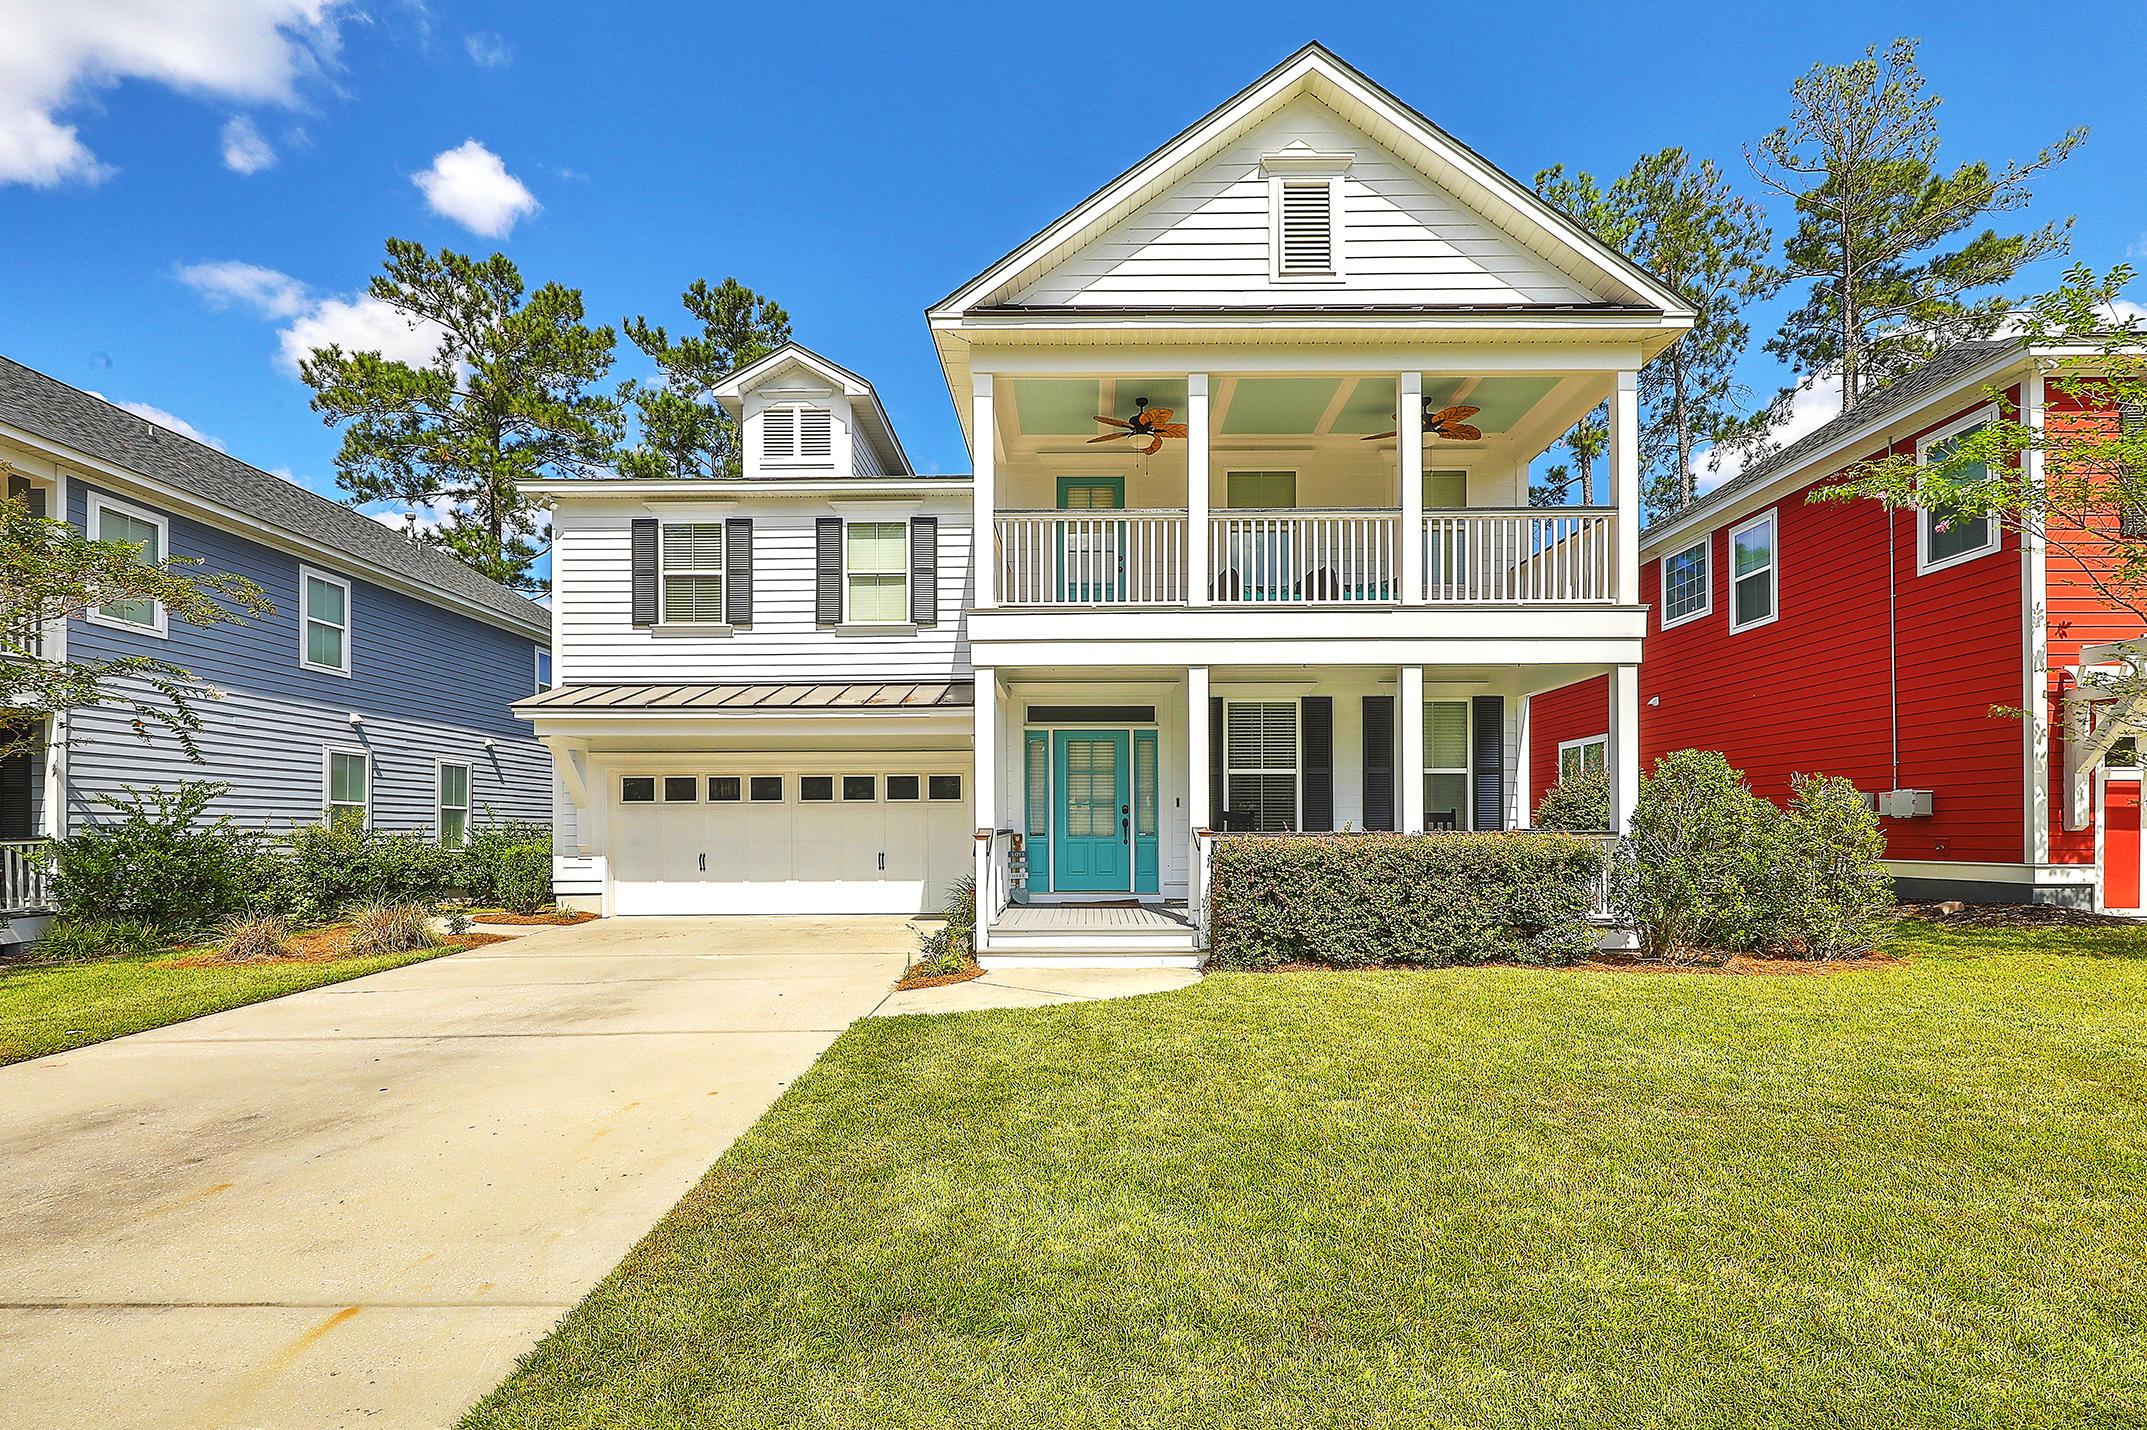 Branch Creek Homes For Sale - 304 Pond Hill, Summerville, SC - 32